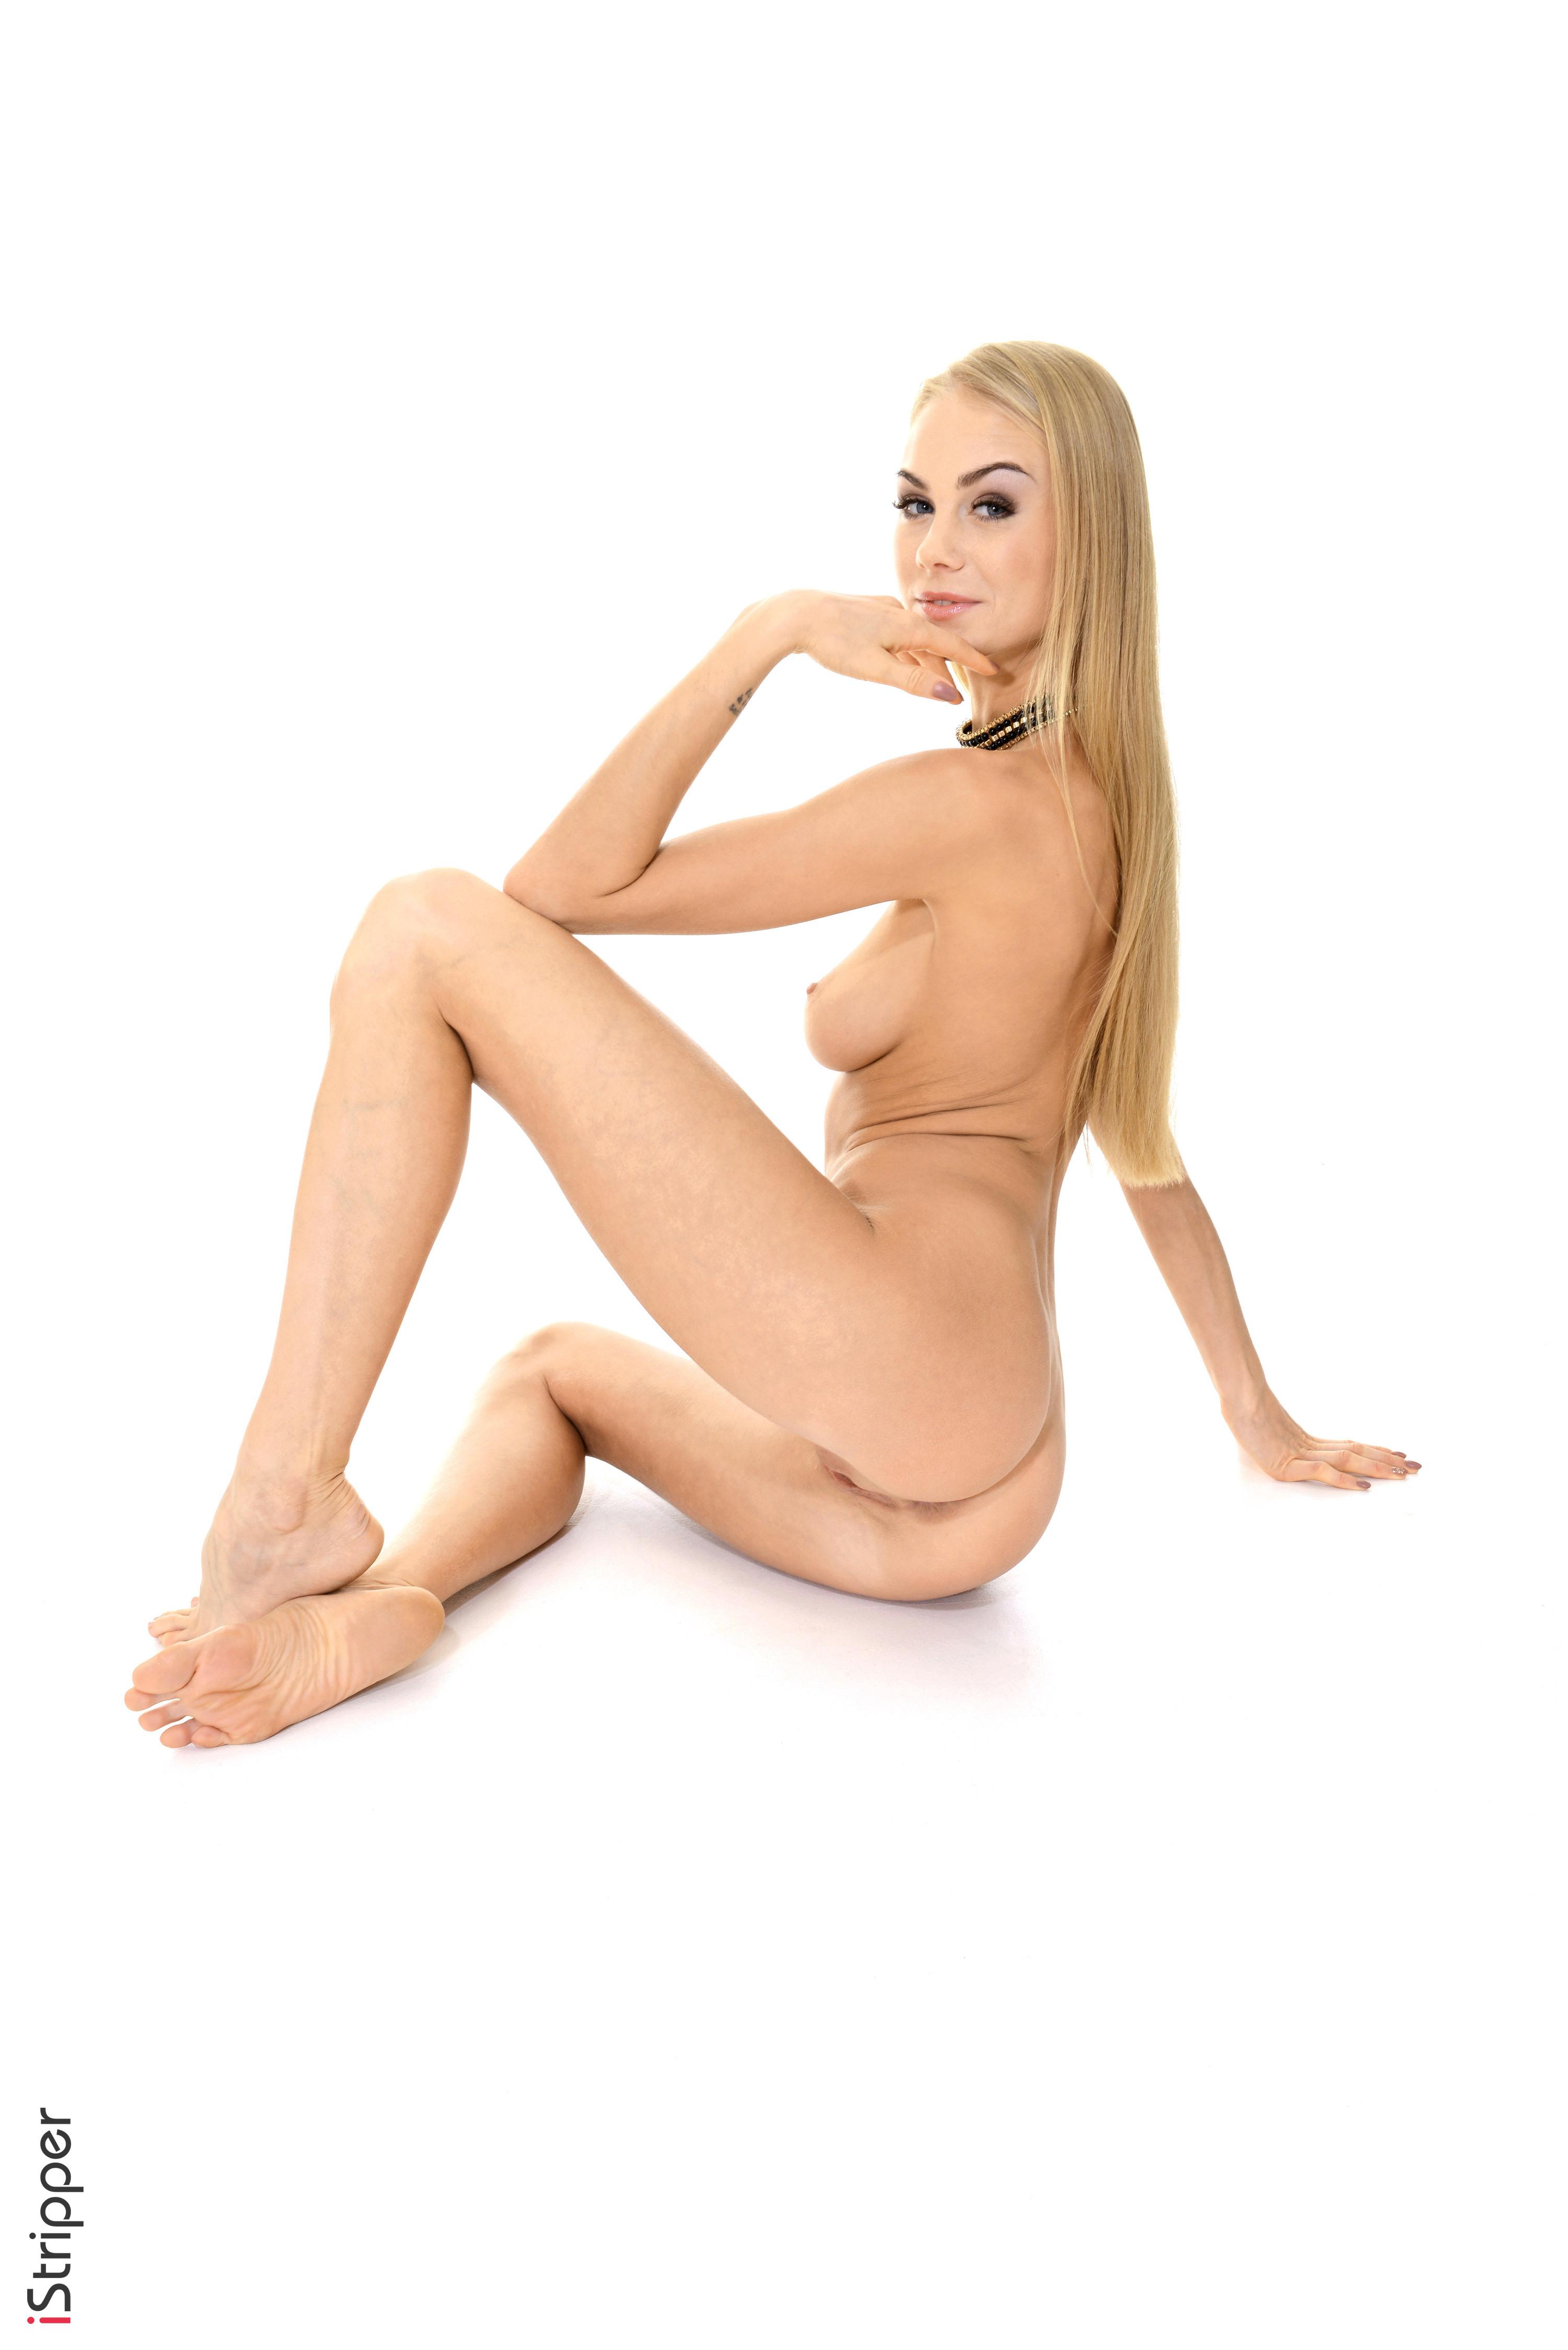 stripping girls nude